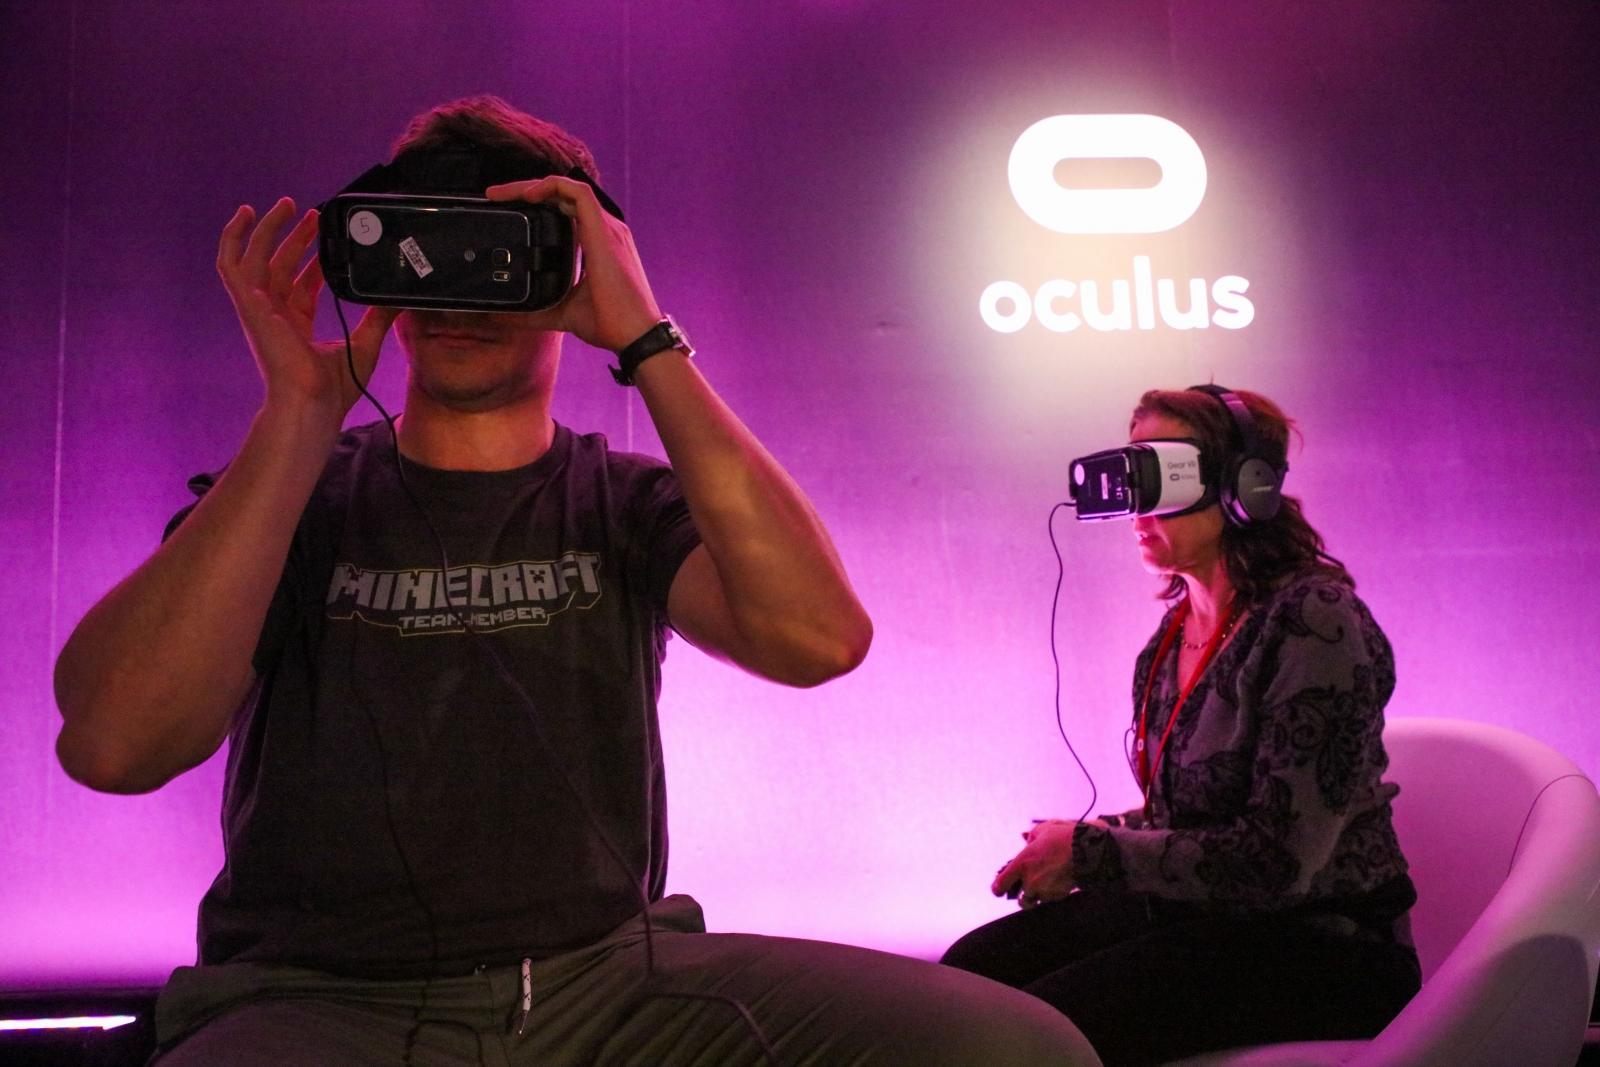 Oculus Rift update makes piracy easier